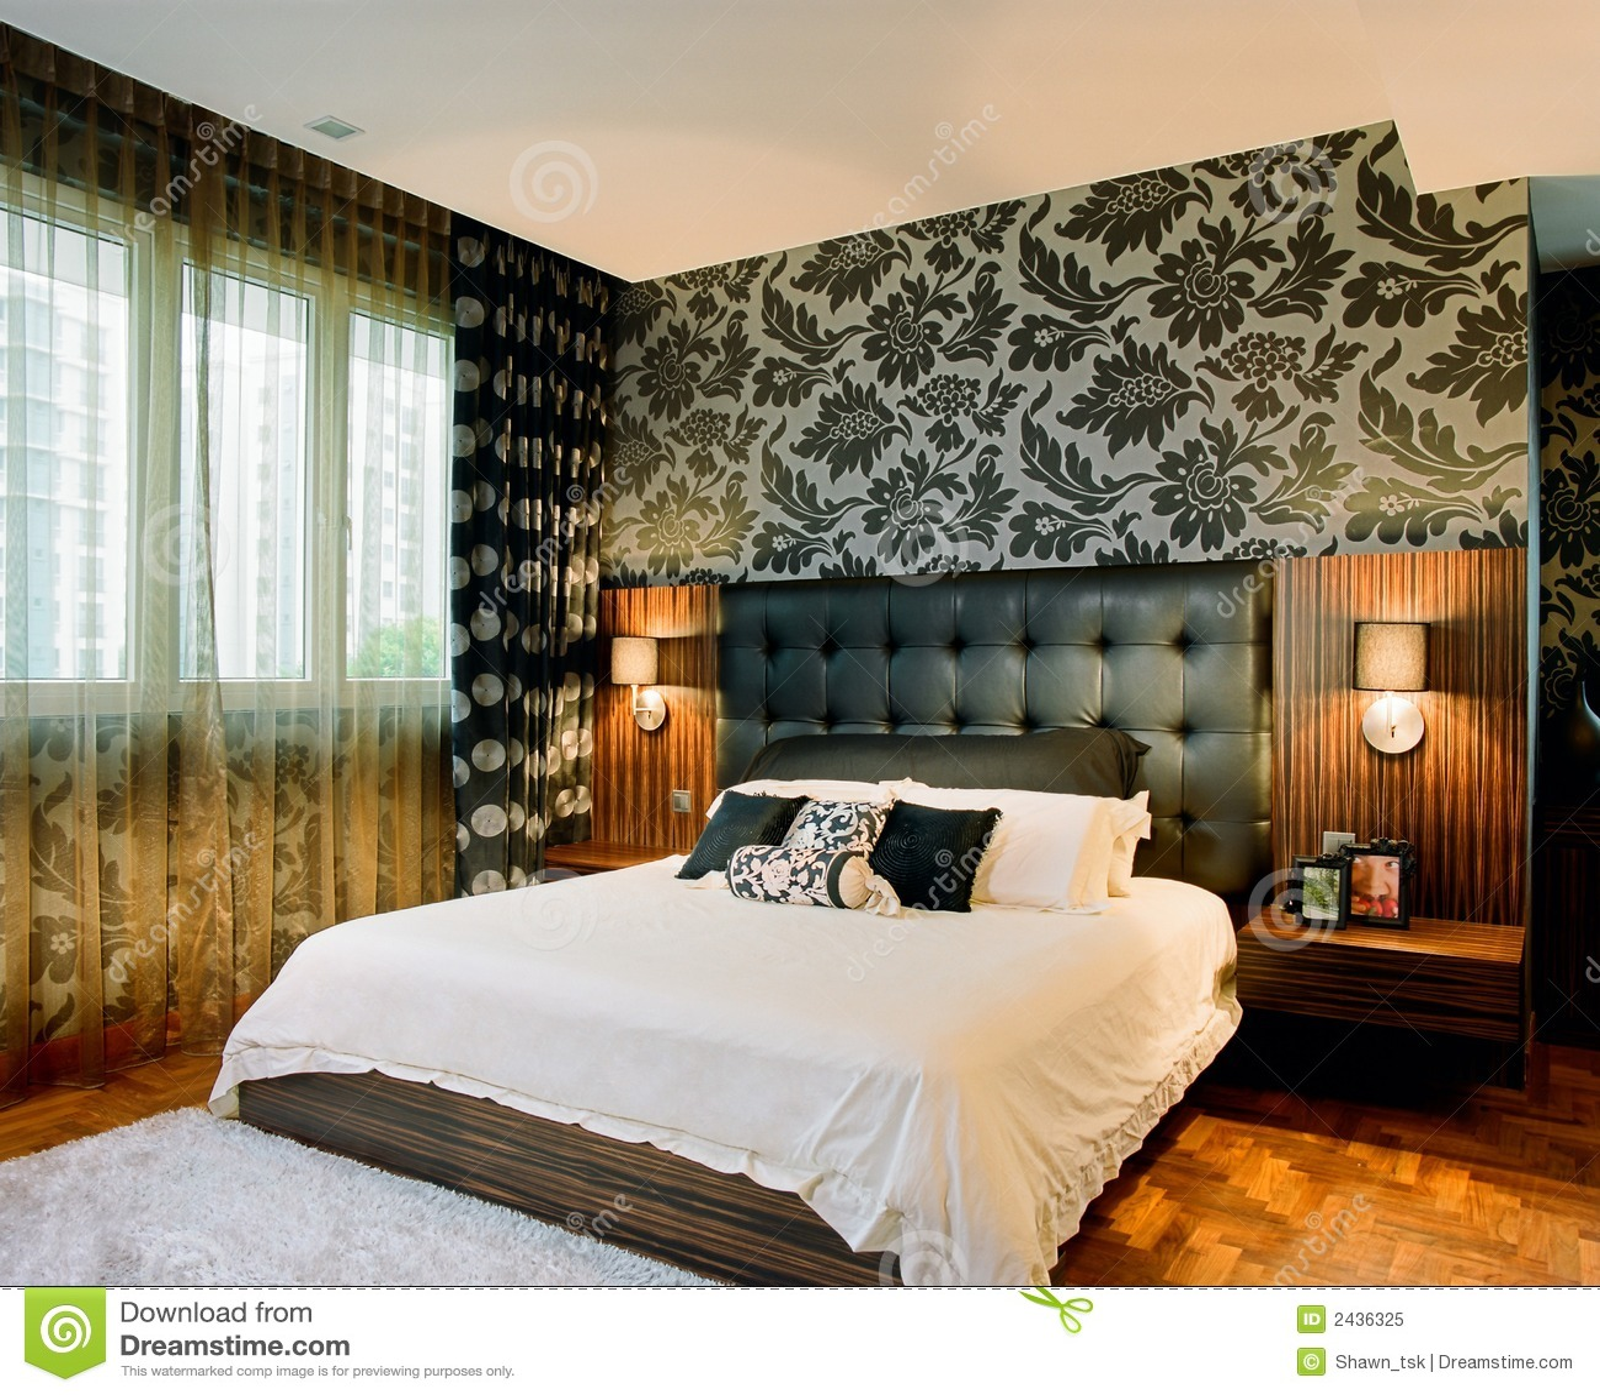 innenarchitektur schlafzimmer stockbild bild 2436325. Black Bedroom Furniture Sets. Home Design Ideas